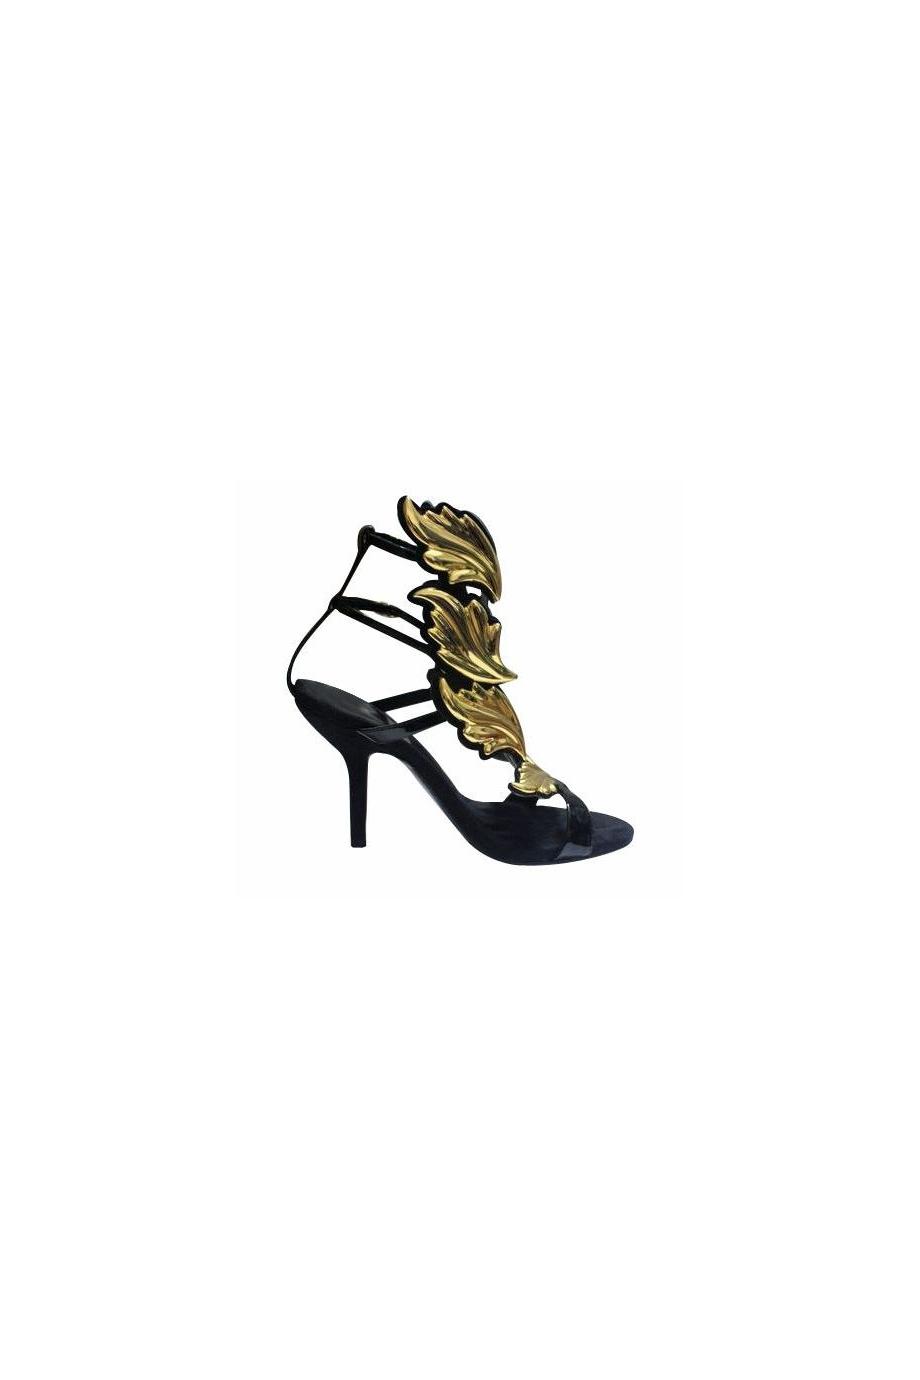 Online store ailsa multi leaves details sandals black